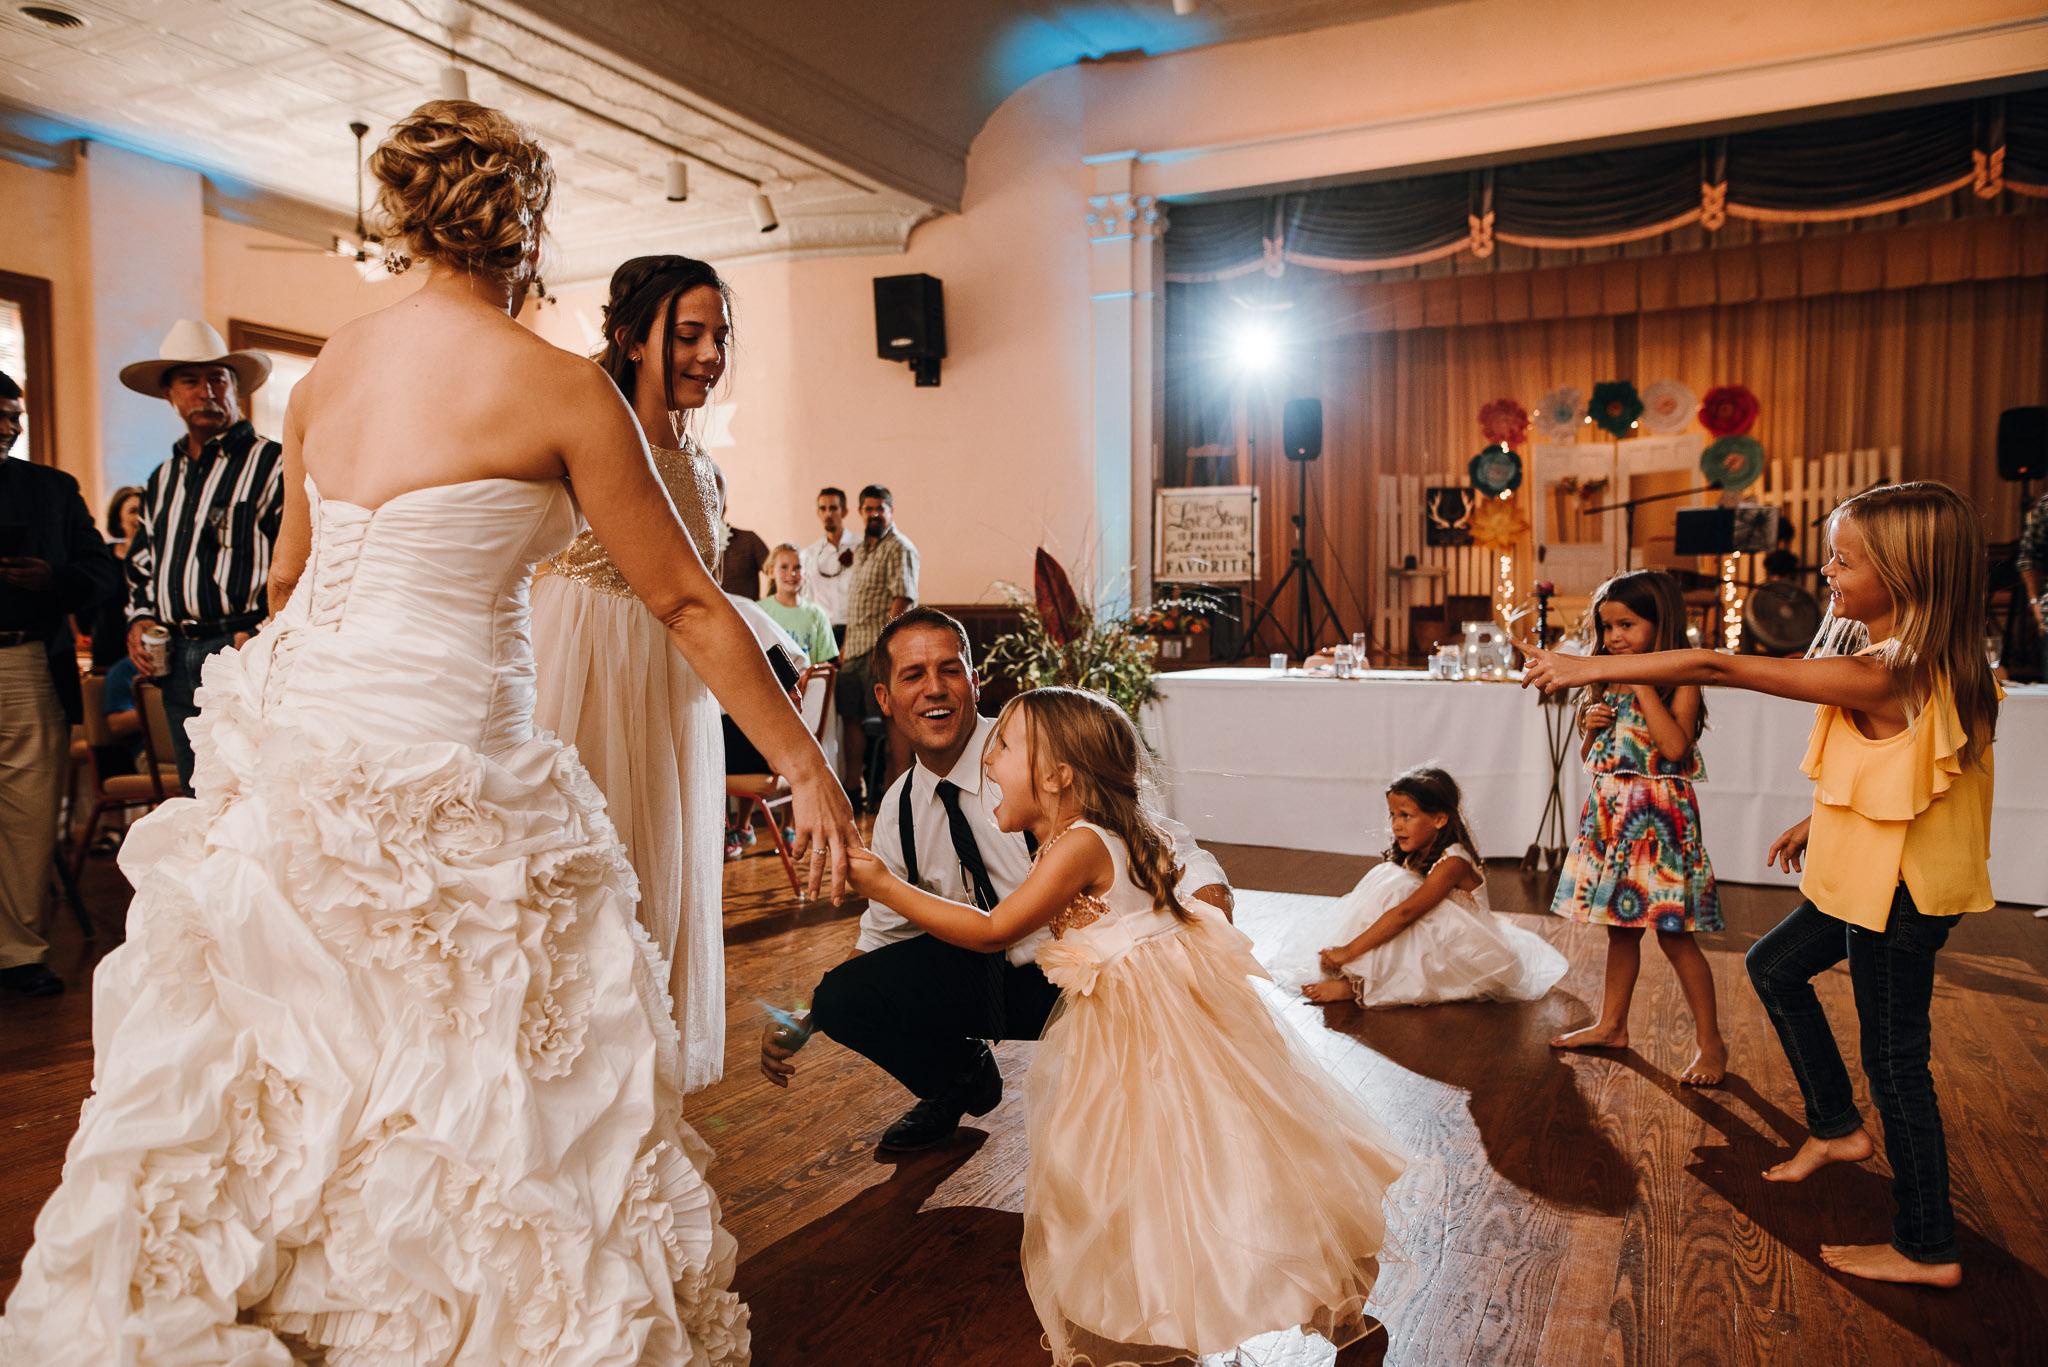 Rowena-West-Texas-Wedding-Photographer-Gillian&Ryan-0040.jpg